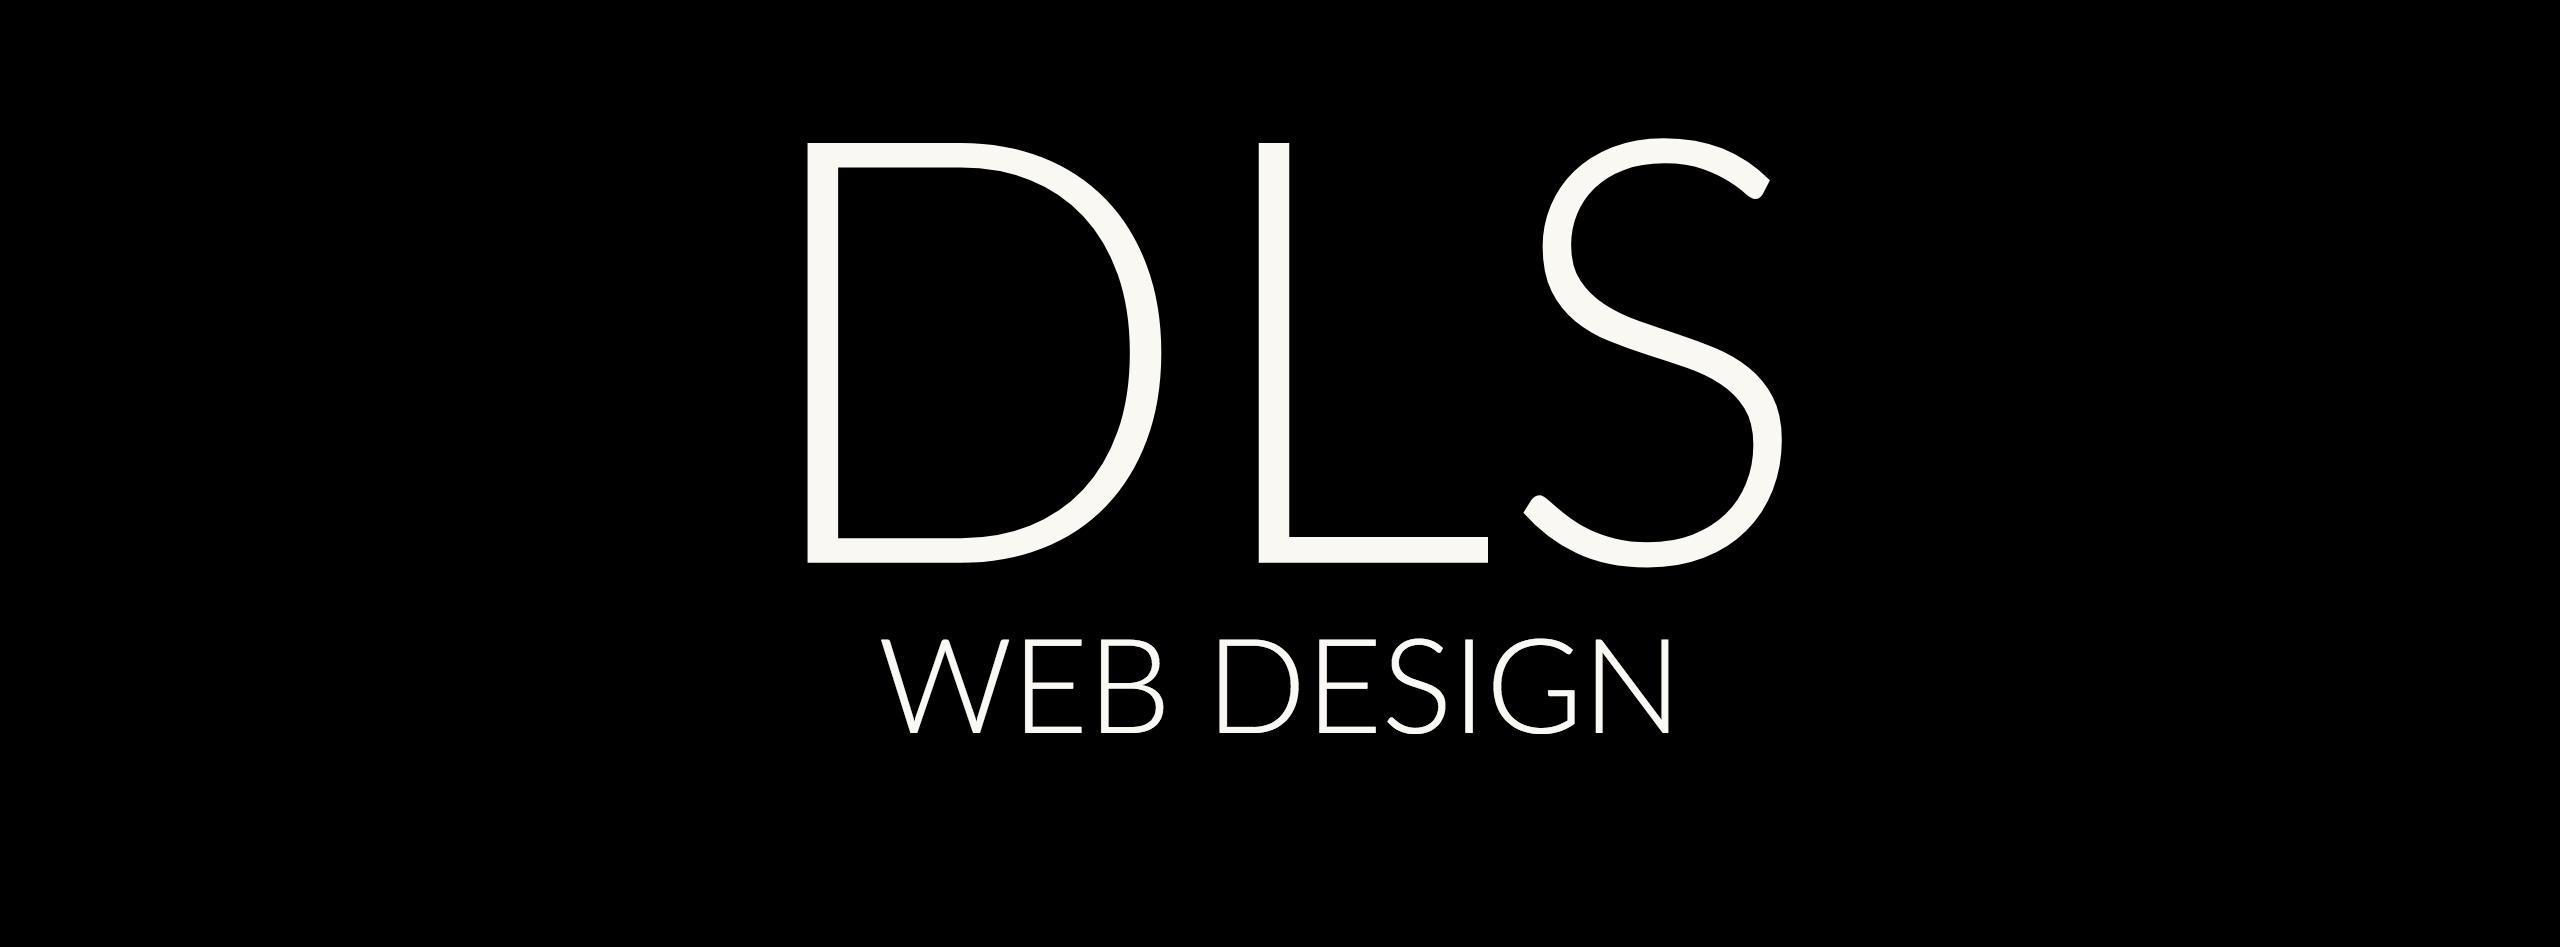 DLS Web Design